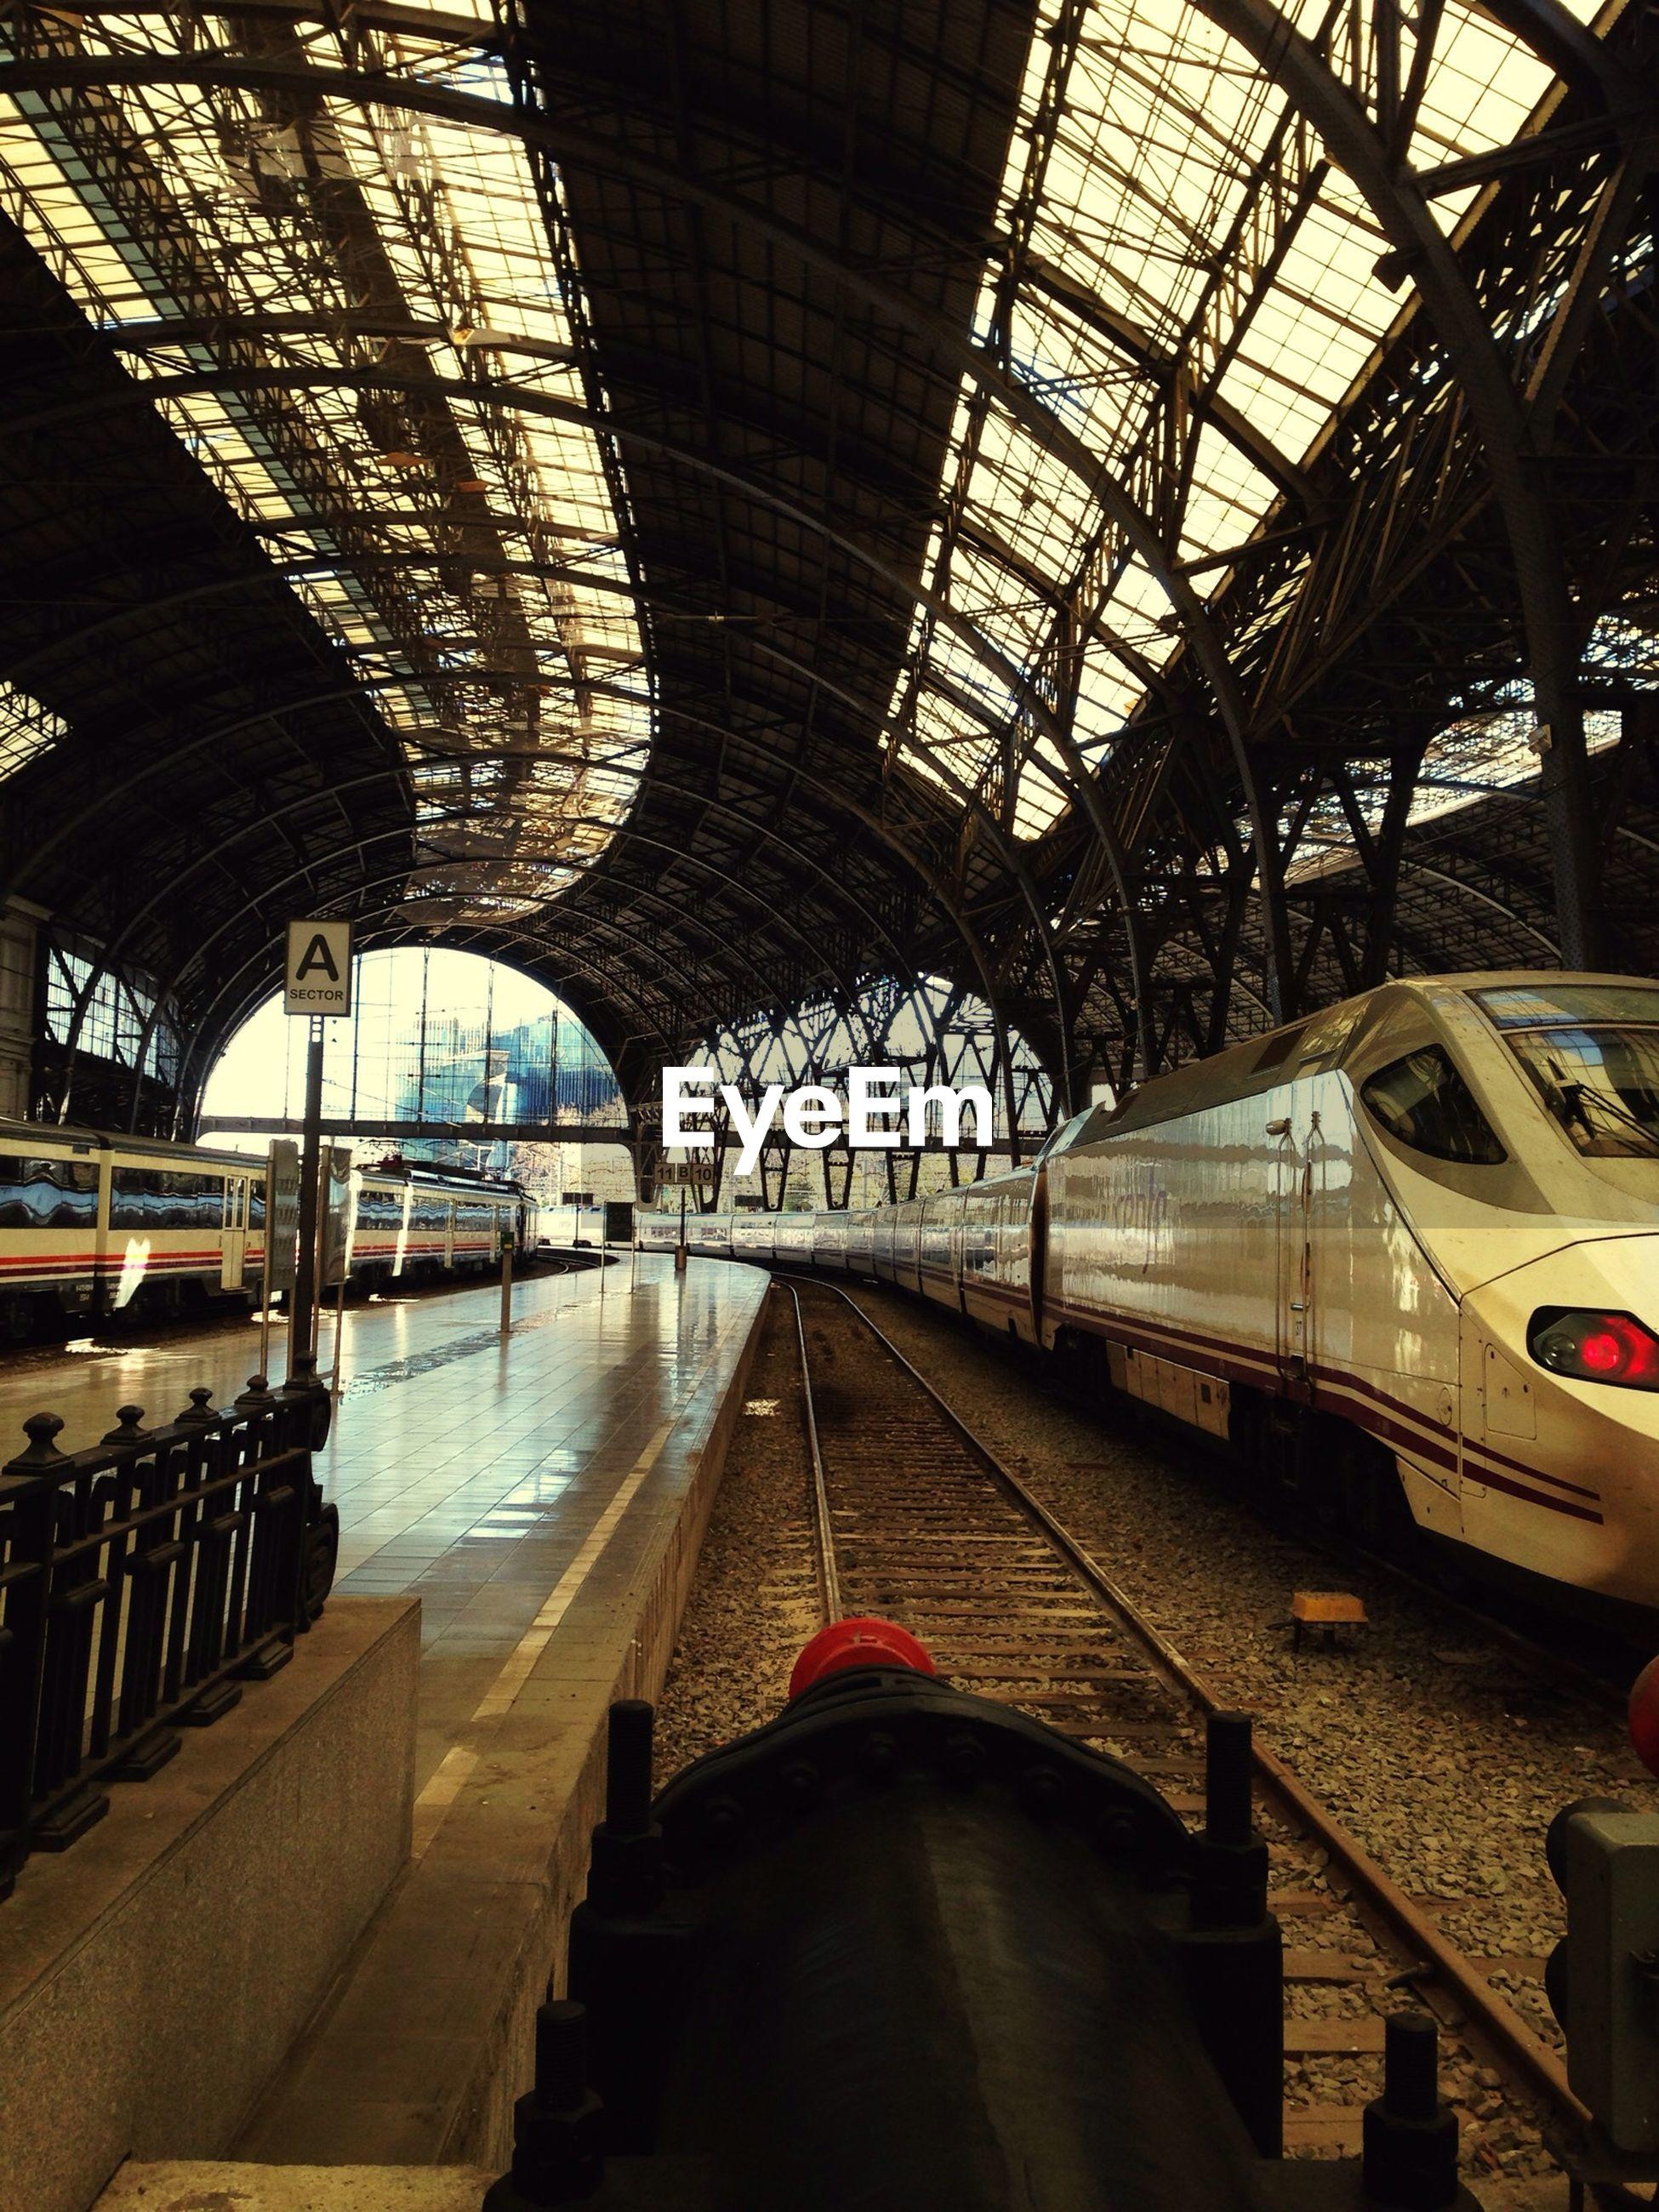 Trains at railroad station